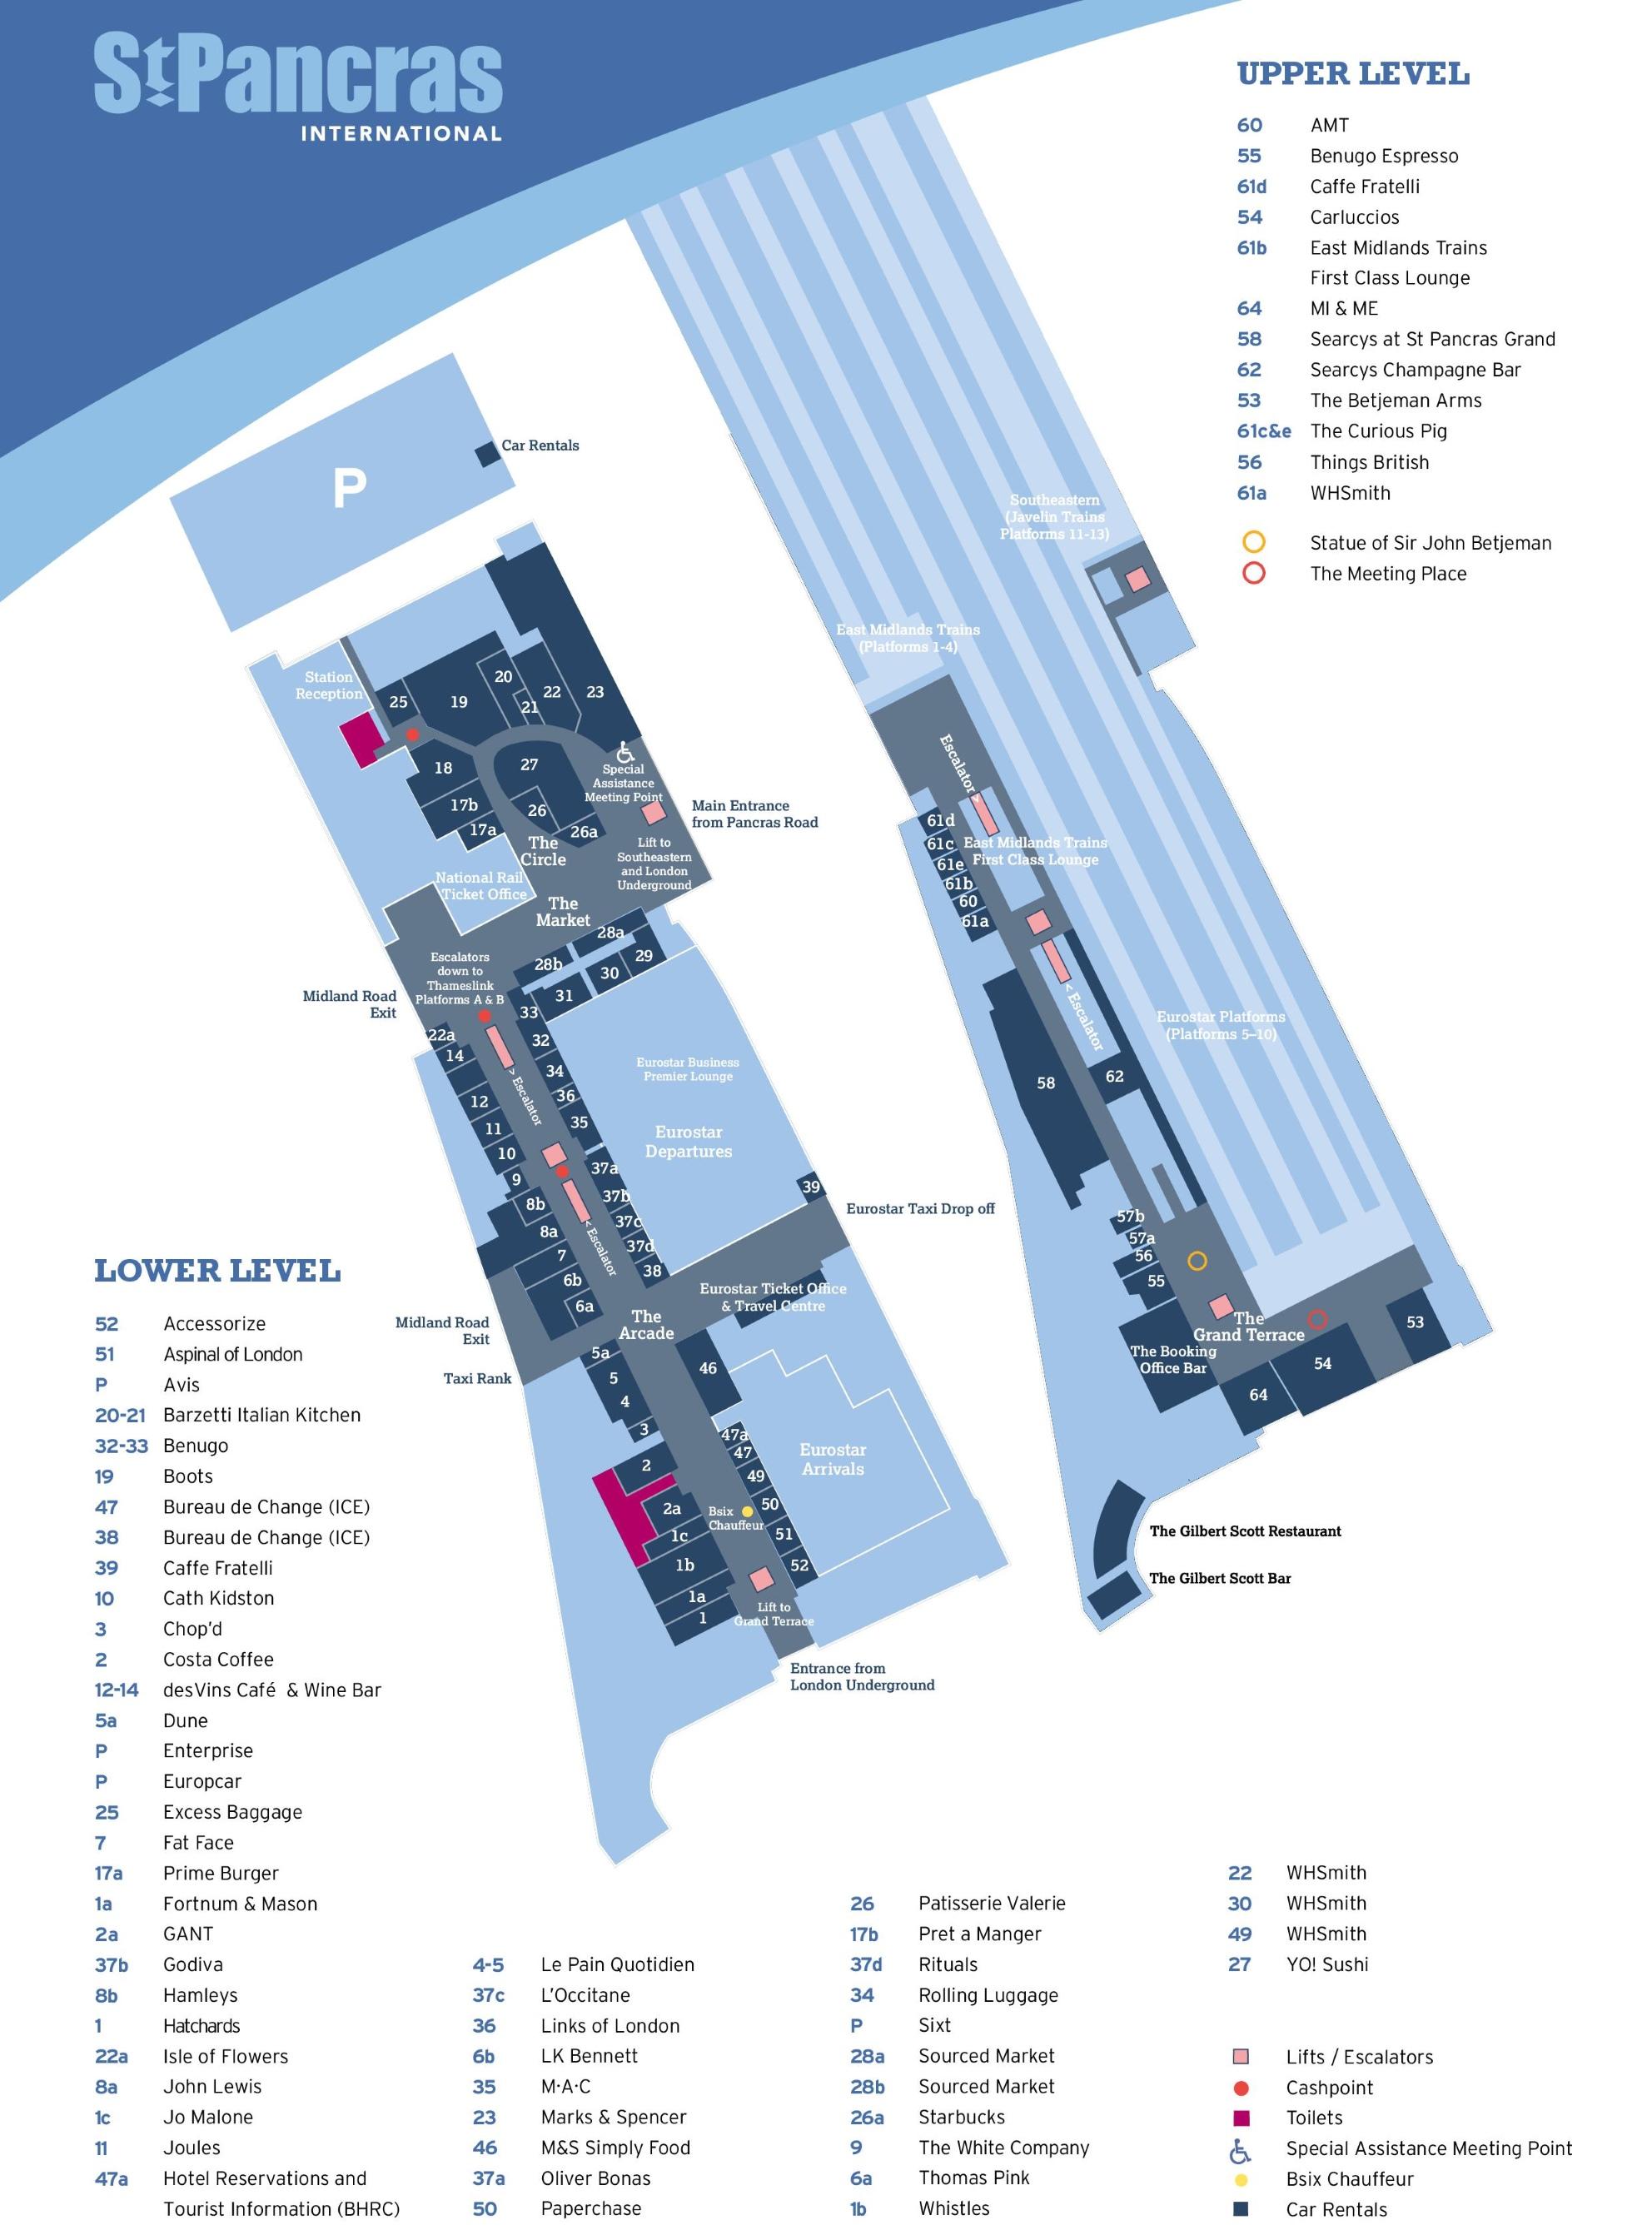 St Pancras railway station map